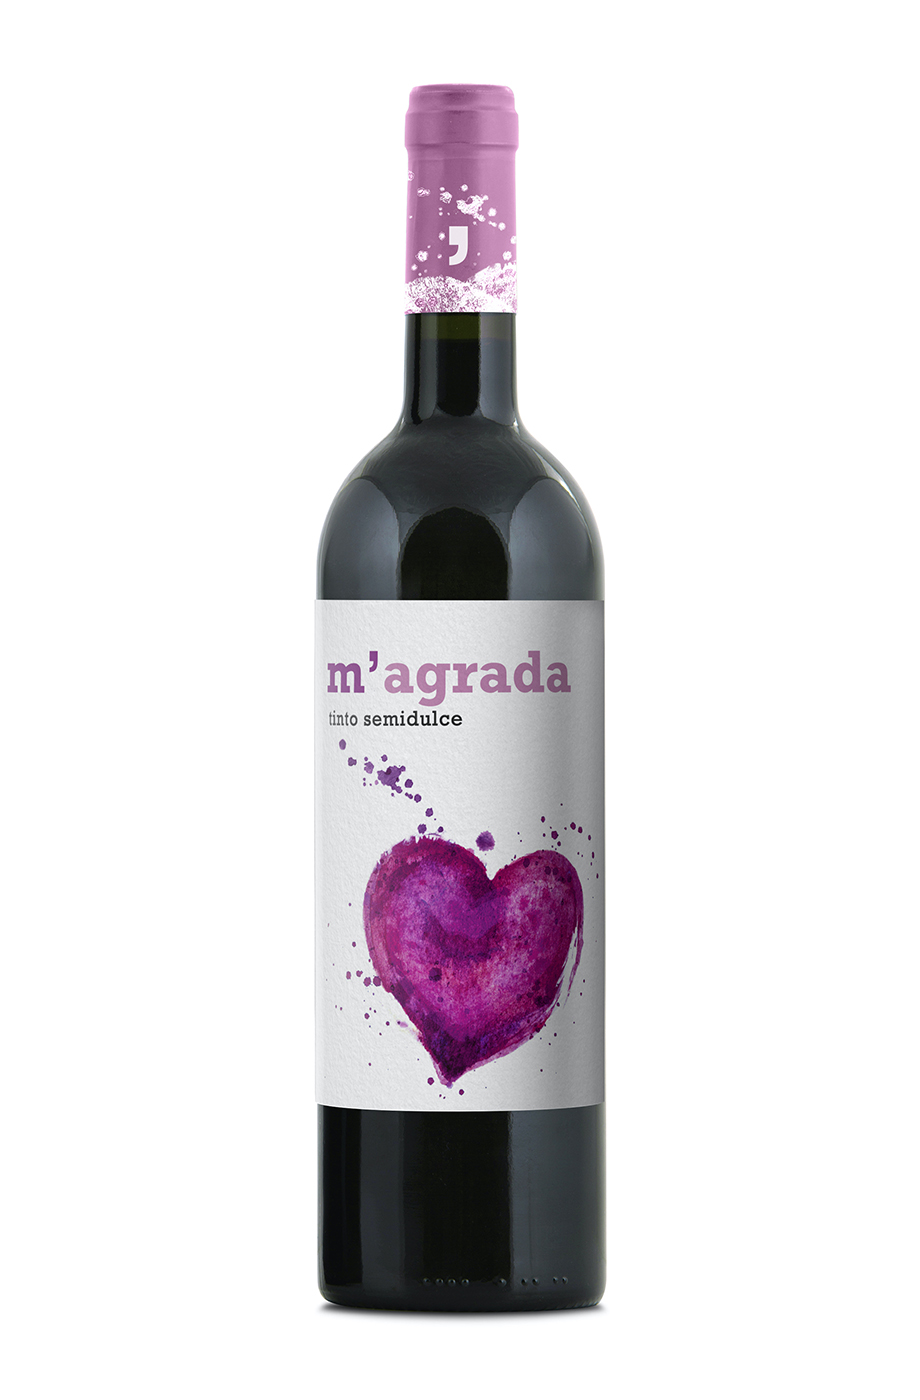 M'Agrada | Winexfood - Winexfood